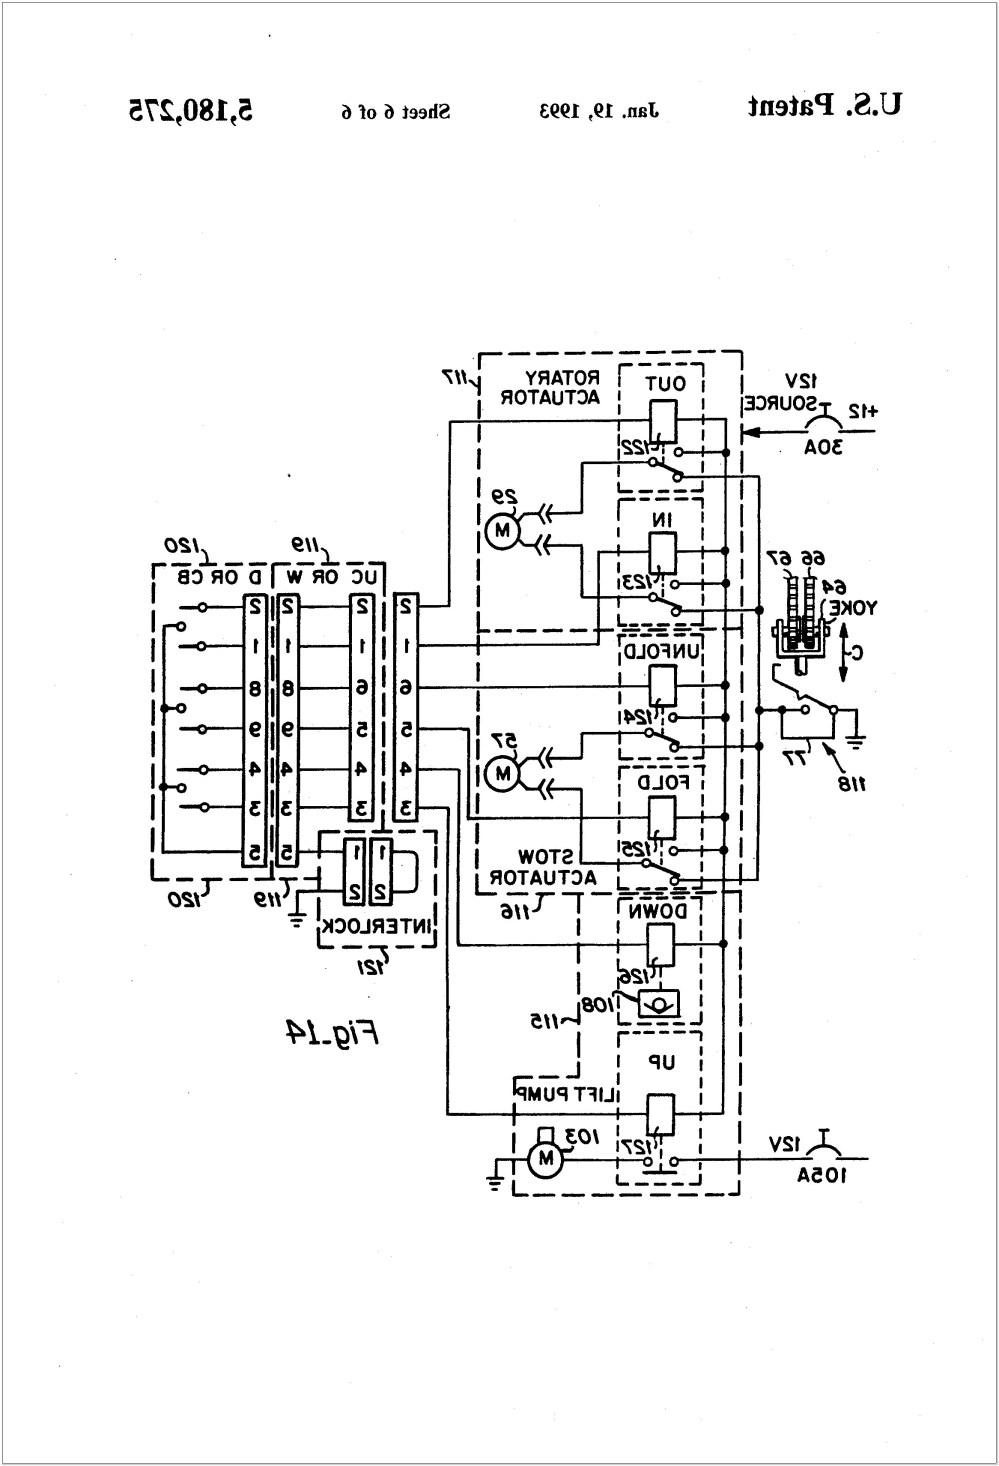 medium resolution of braun wiring diagram wiring diagram basic wheelchair lift wiring diagram schematic